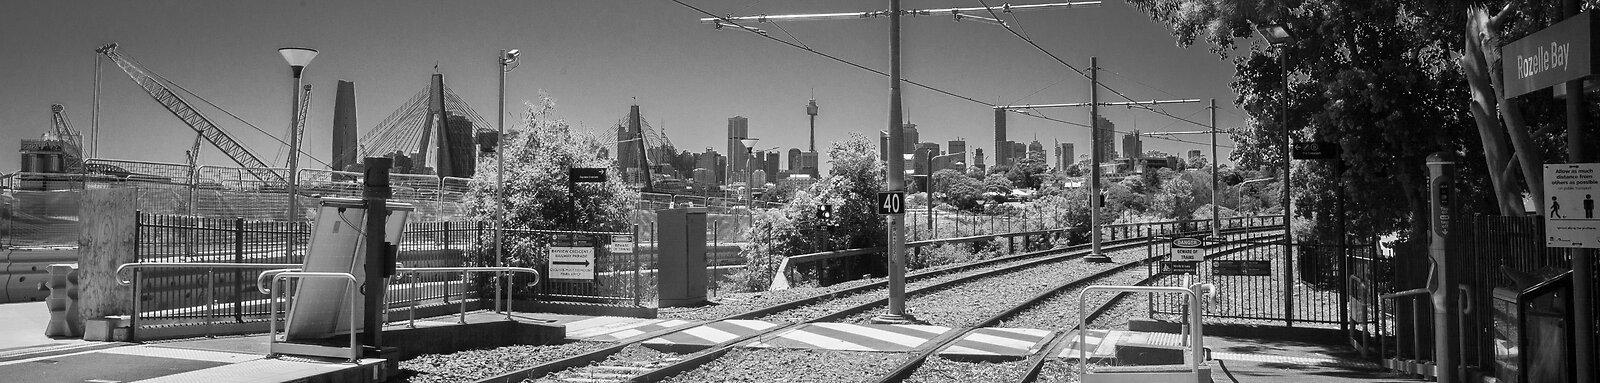 Cityscape.jpg